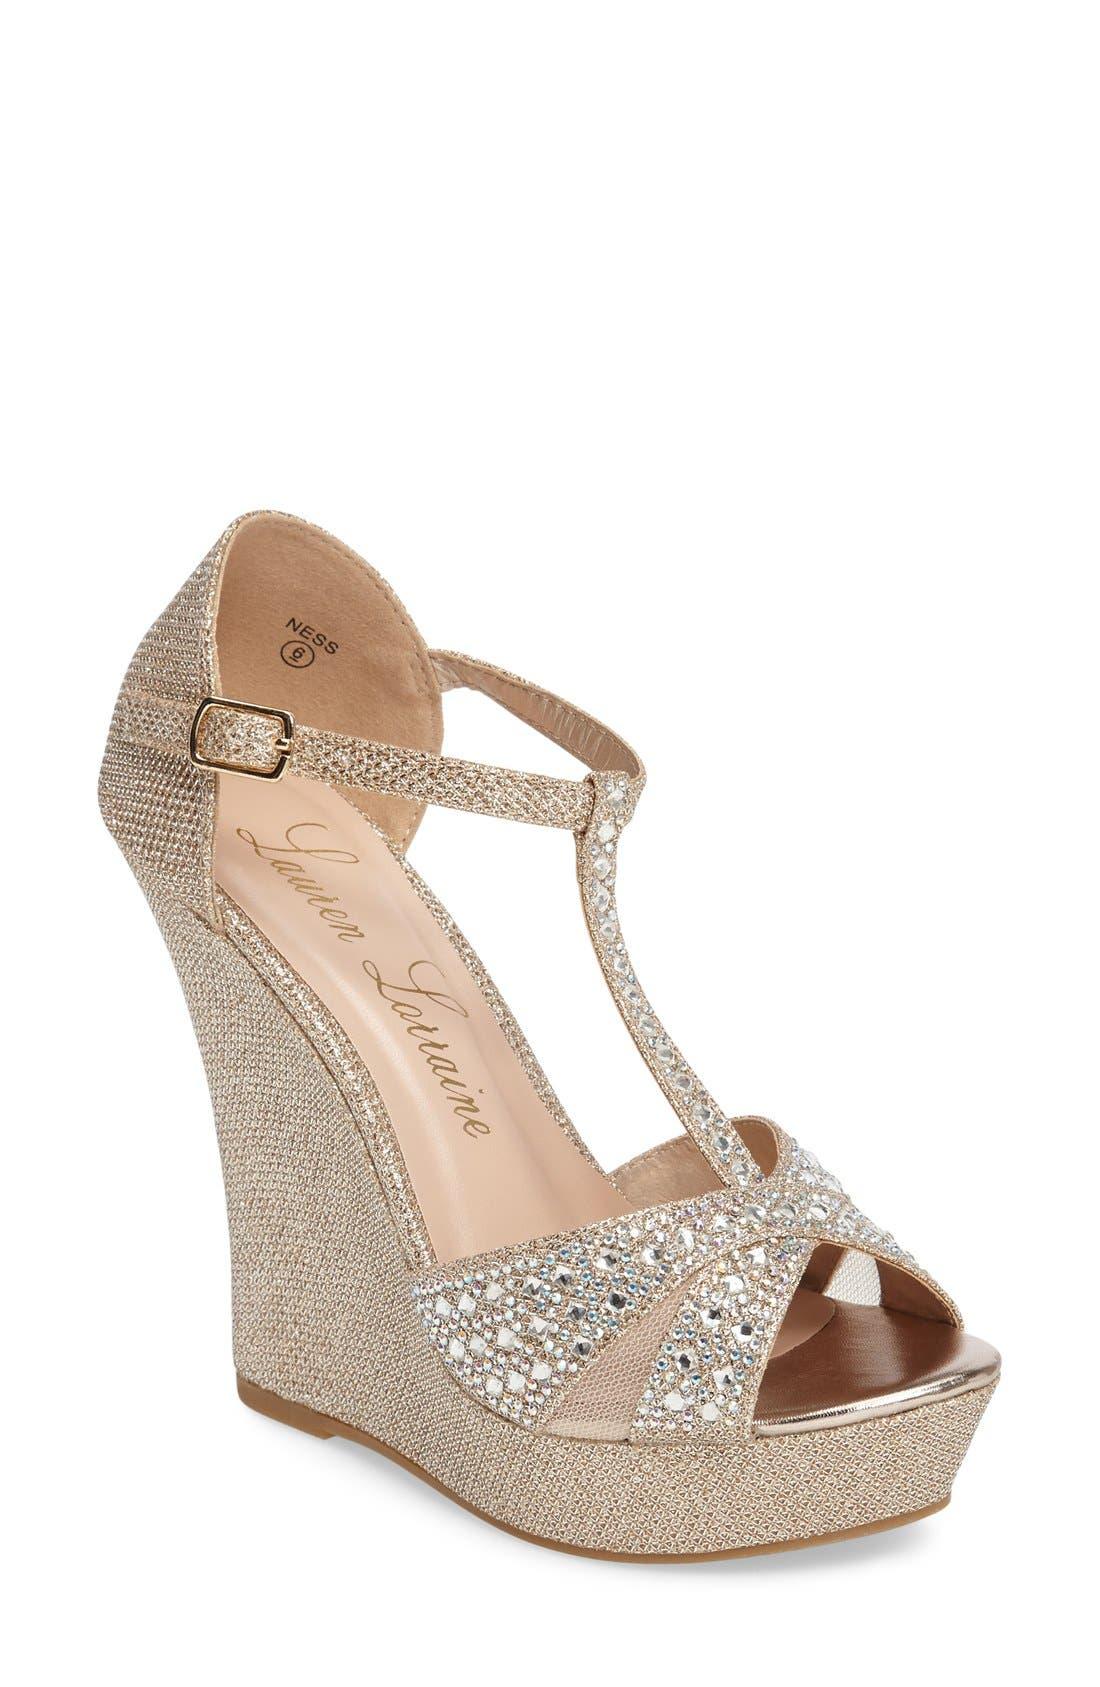 Ness Crystal Embellished Wedge Sandal,                             Main thumbnail 3, color,